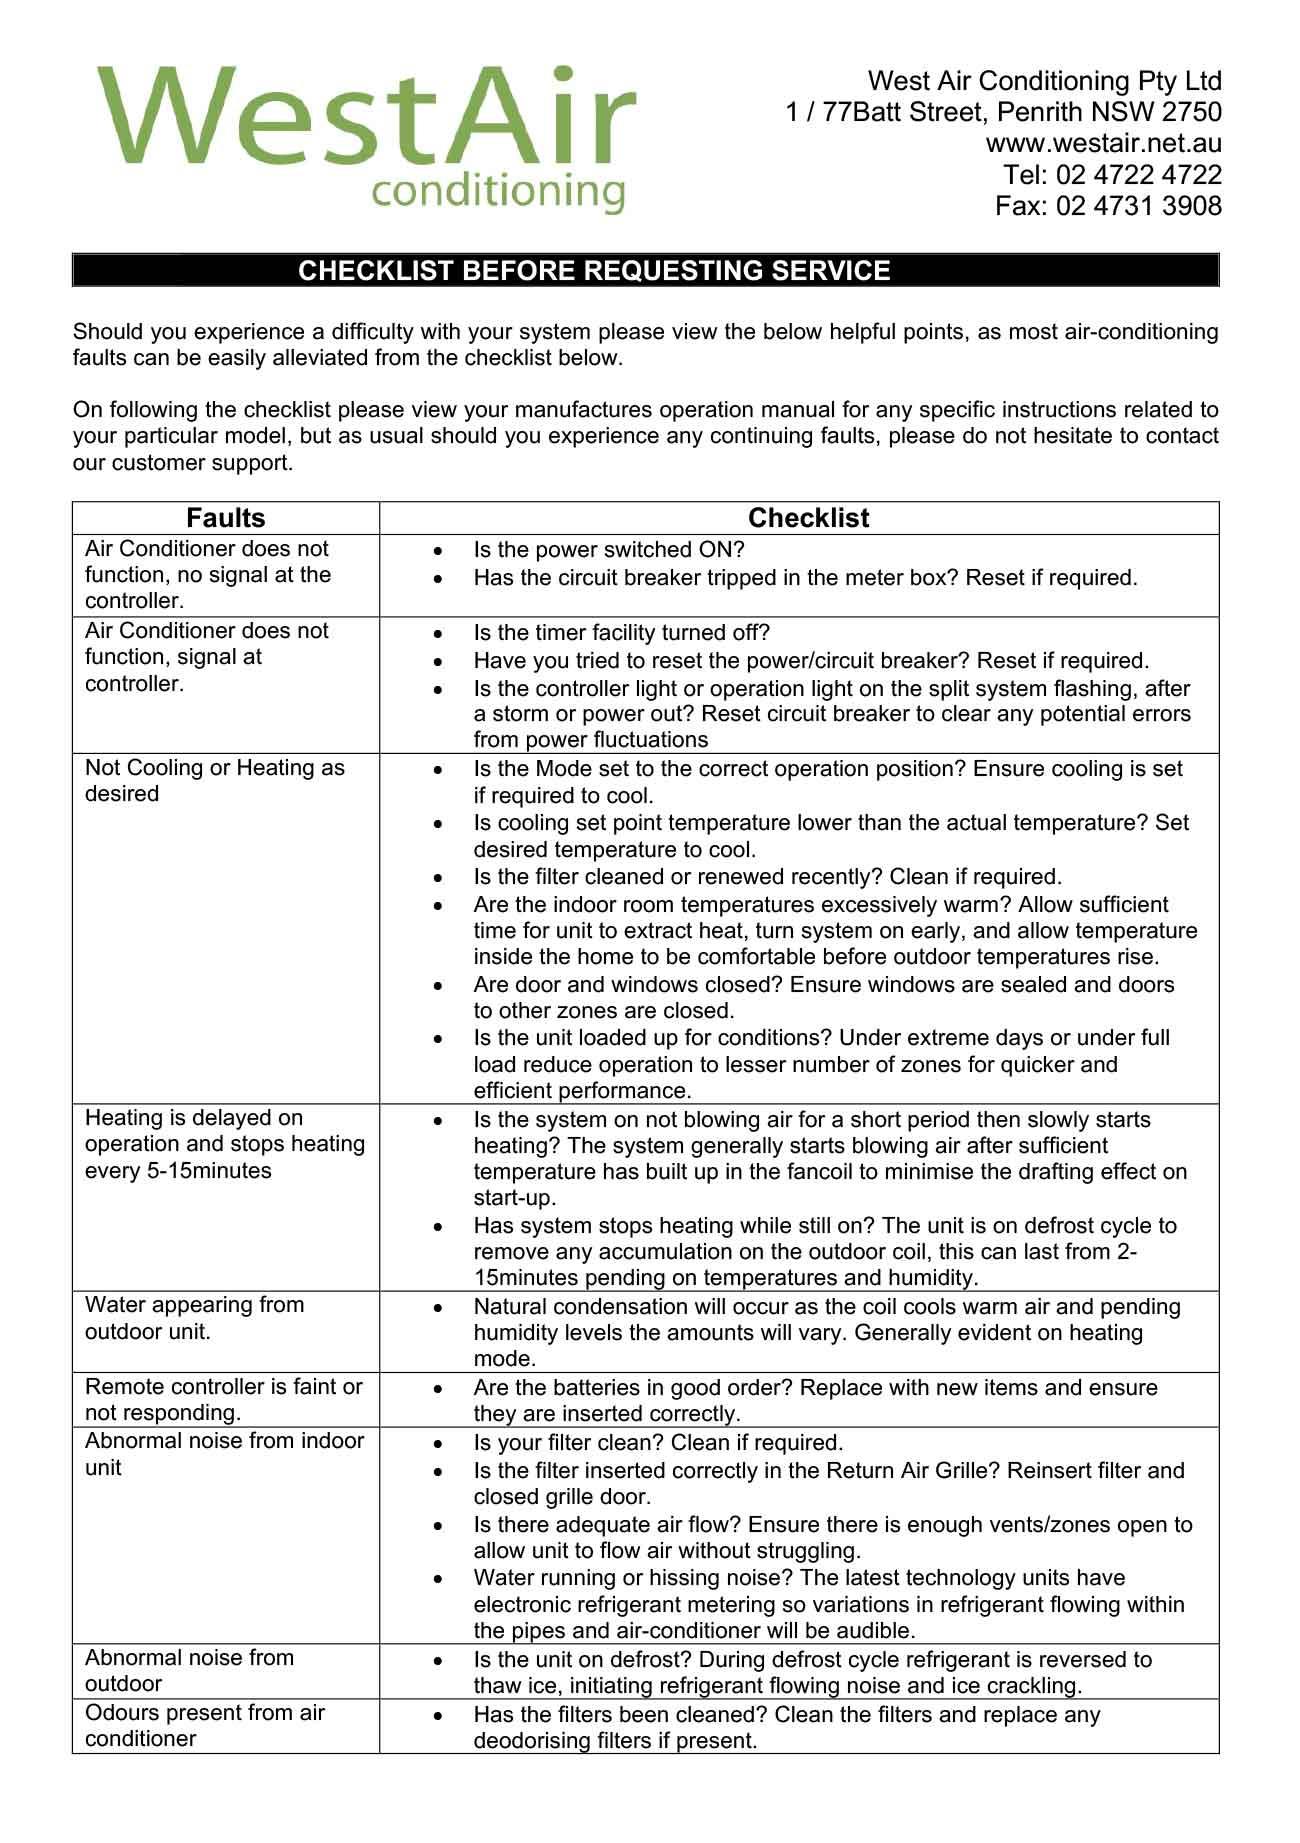 Diagnostic Checklist West Air Conditioning